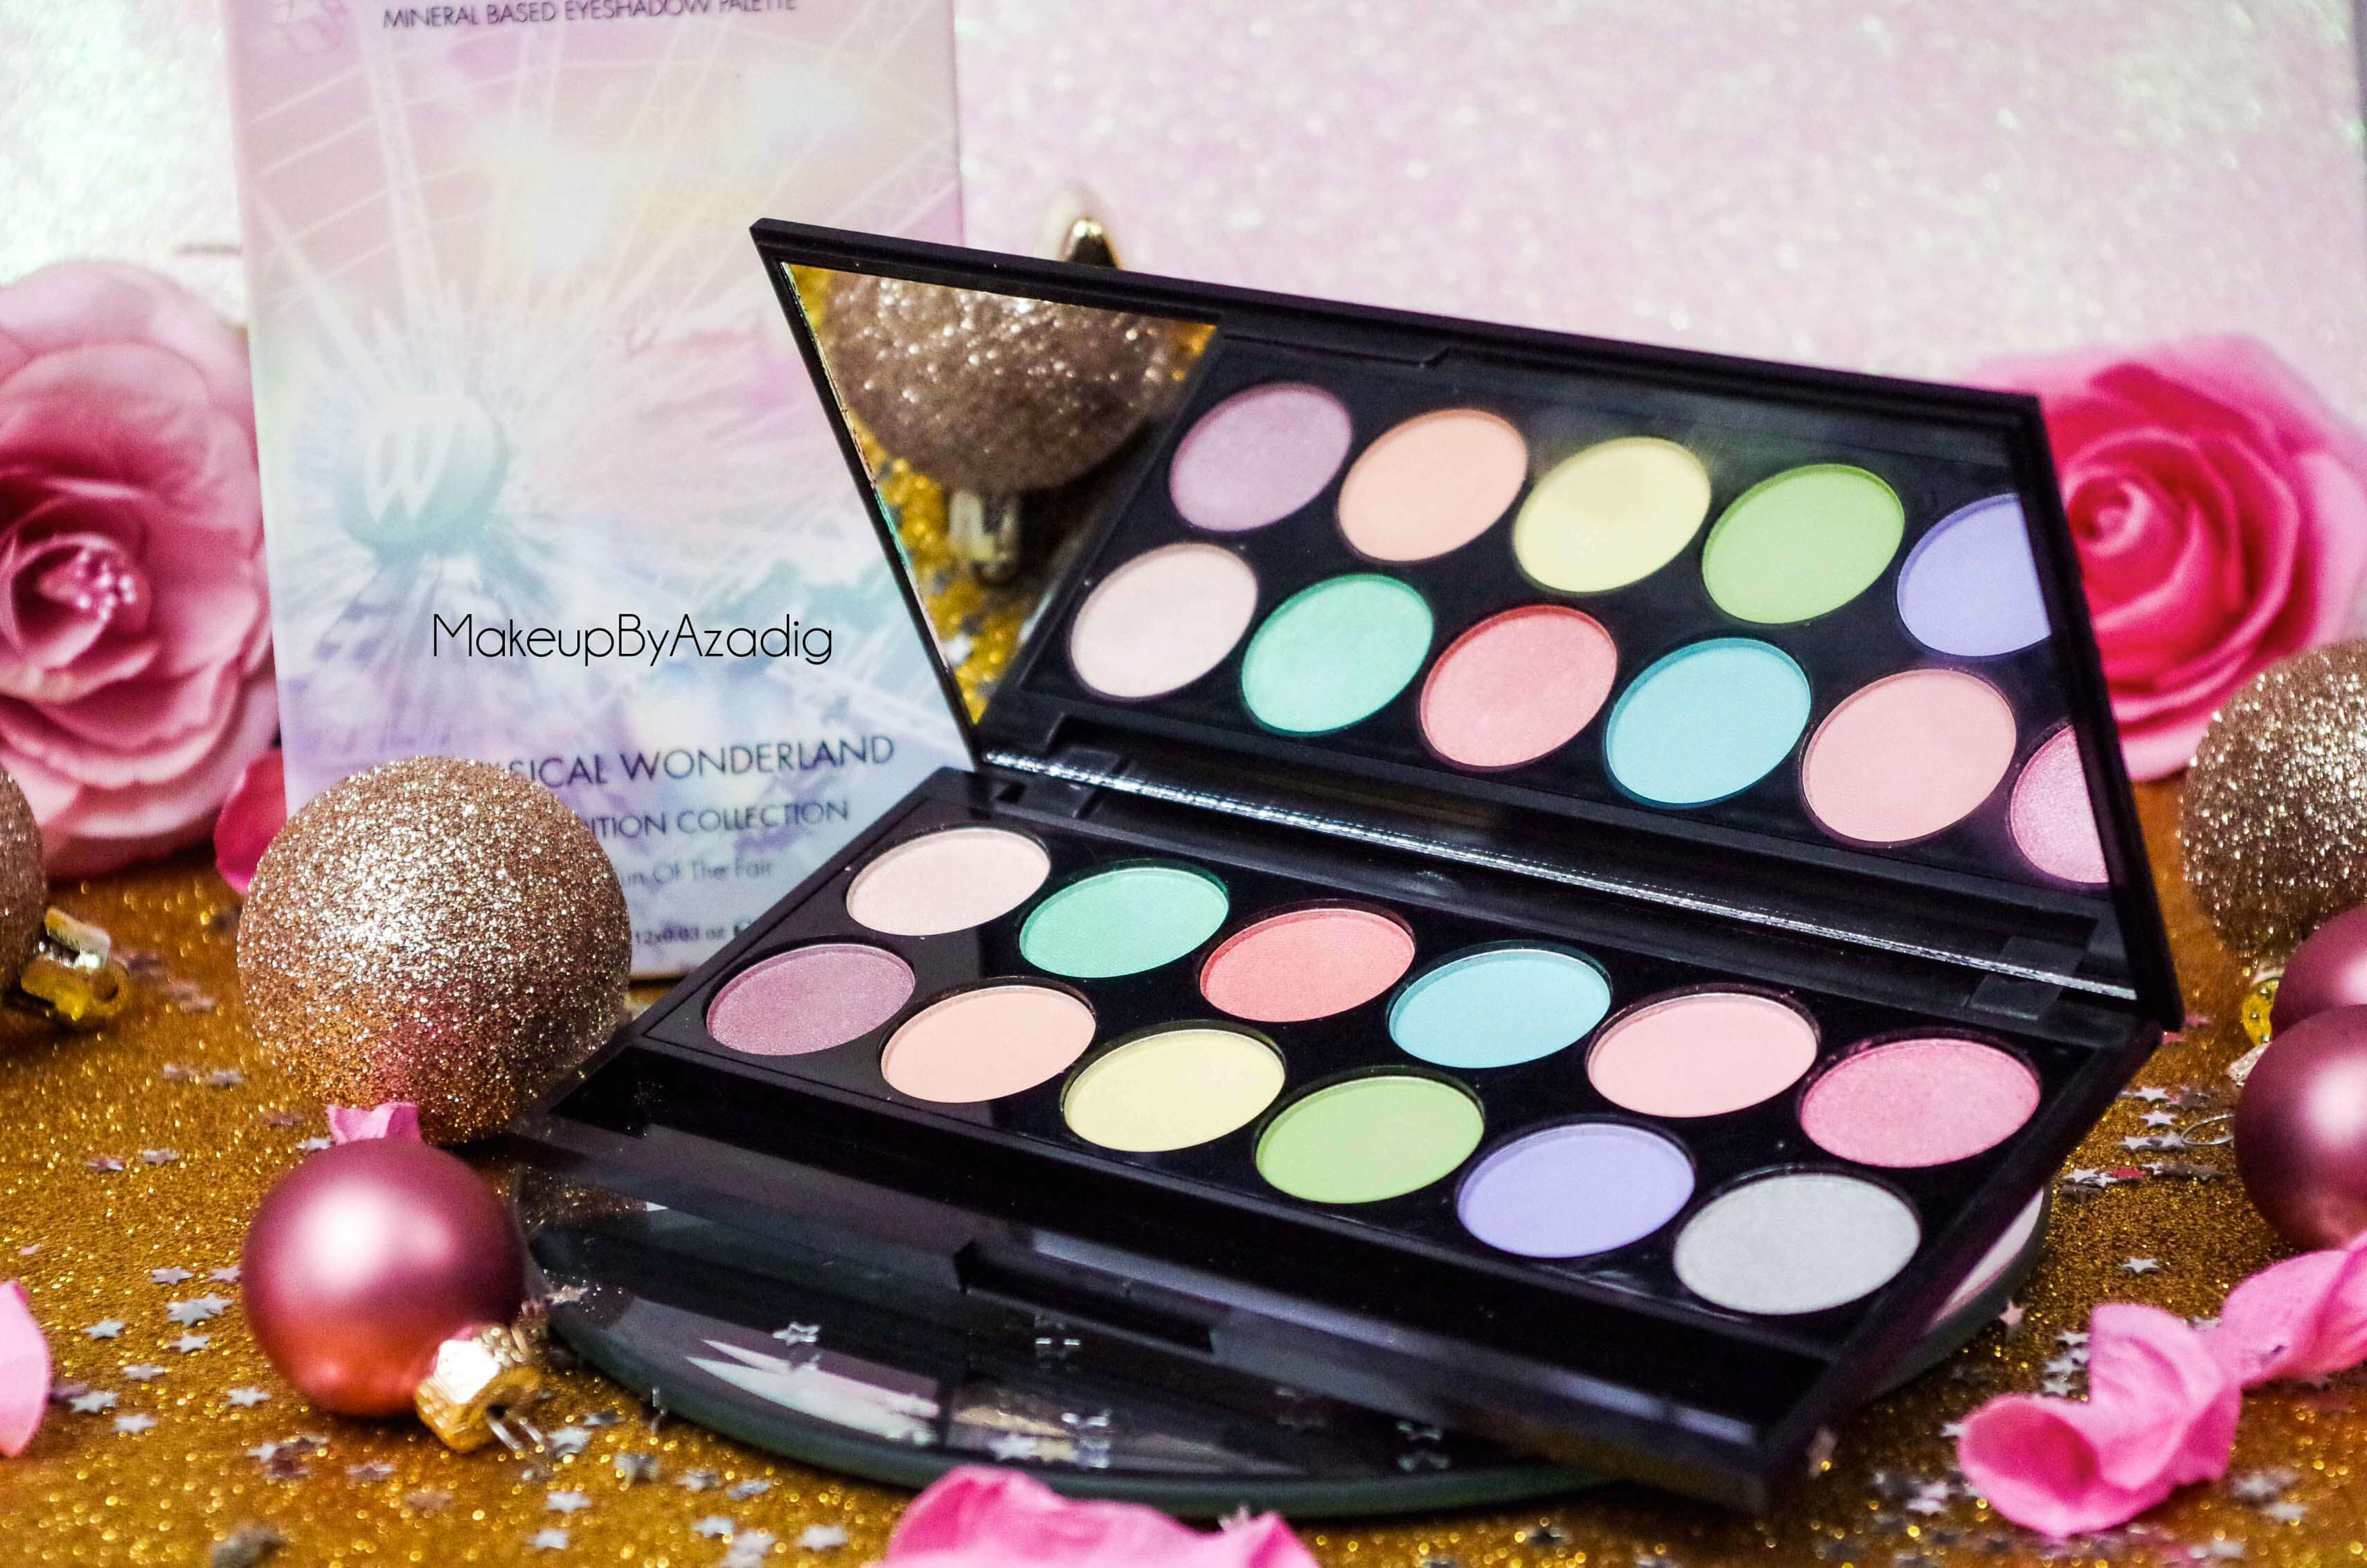 review-palette-sleek-makeup-idivine-pas-cher-sephora-couleurs-allthefunofthefair-code-promo-sephora-paris-makeupbyazadig-magique-2